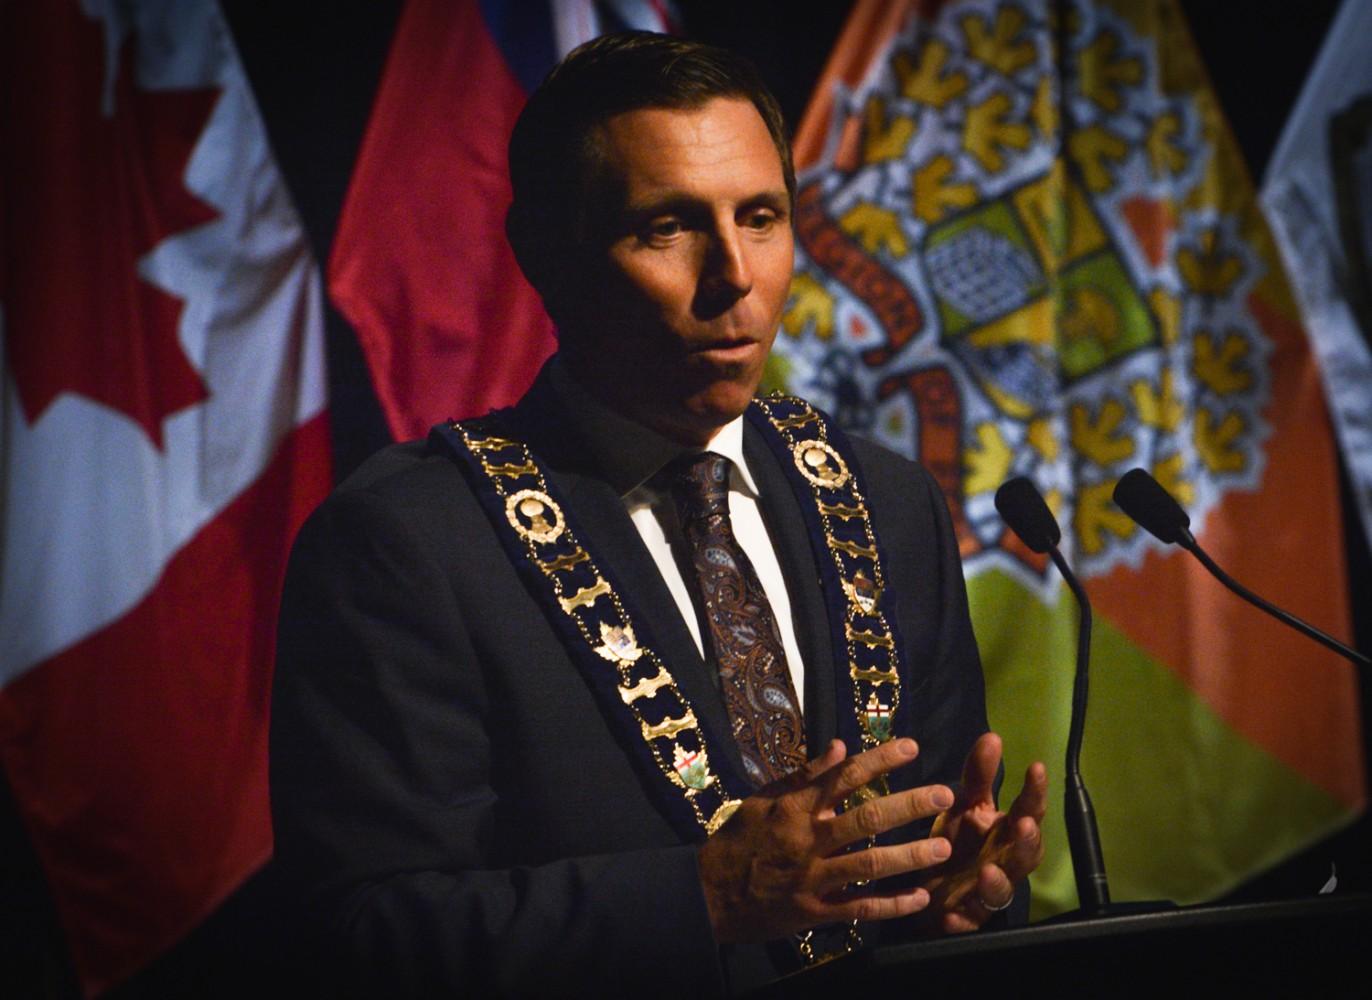 New Mayor Patrick Brown's inaugural address laser-focused on boosting Brampton's economy